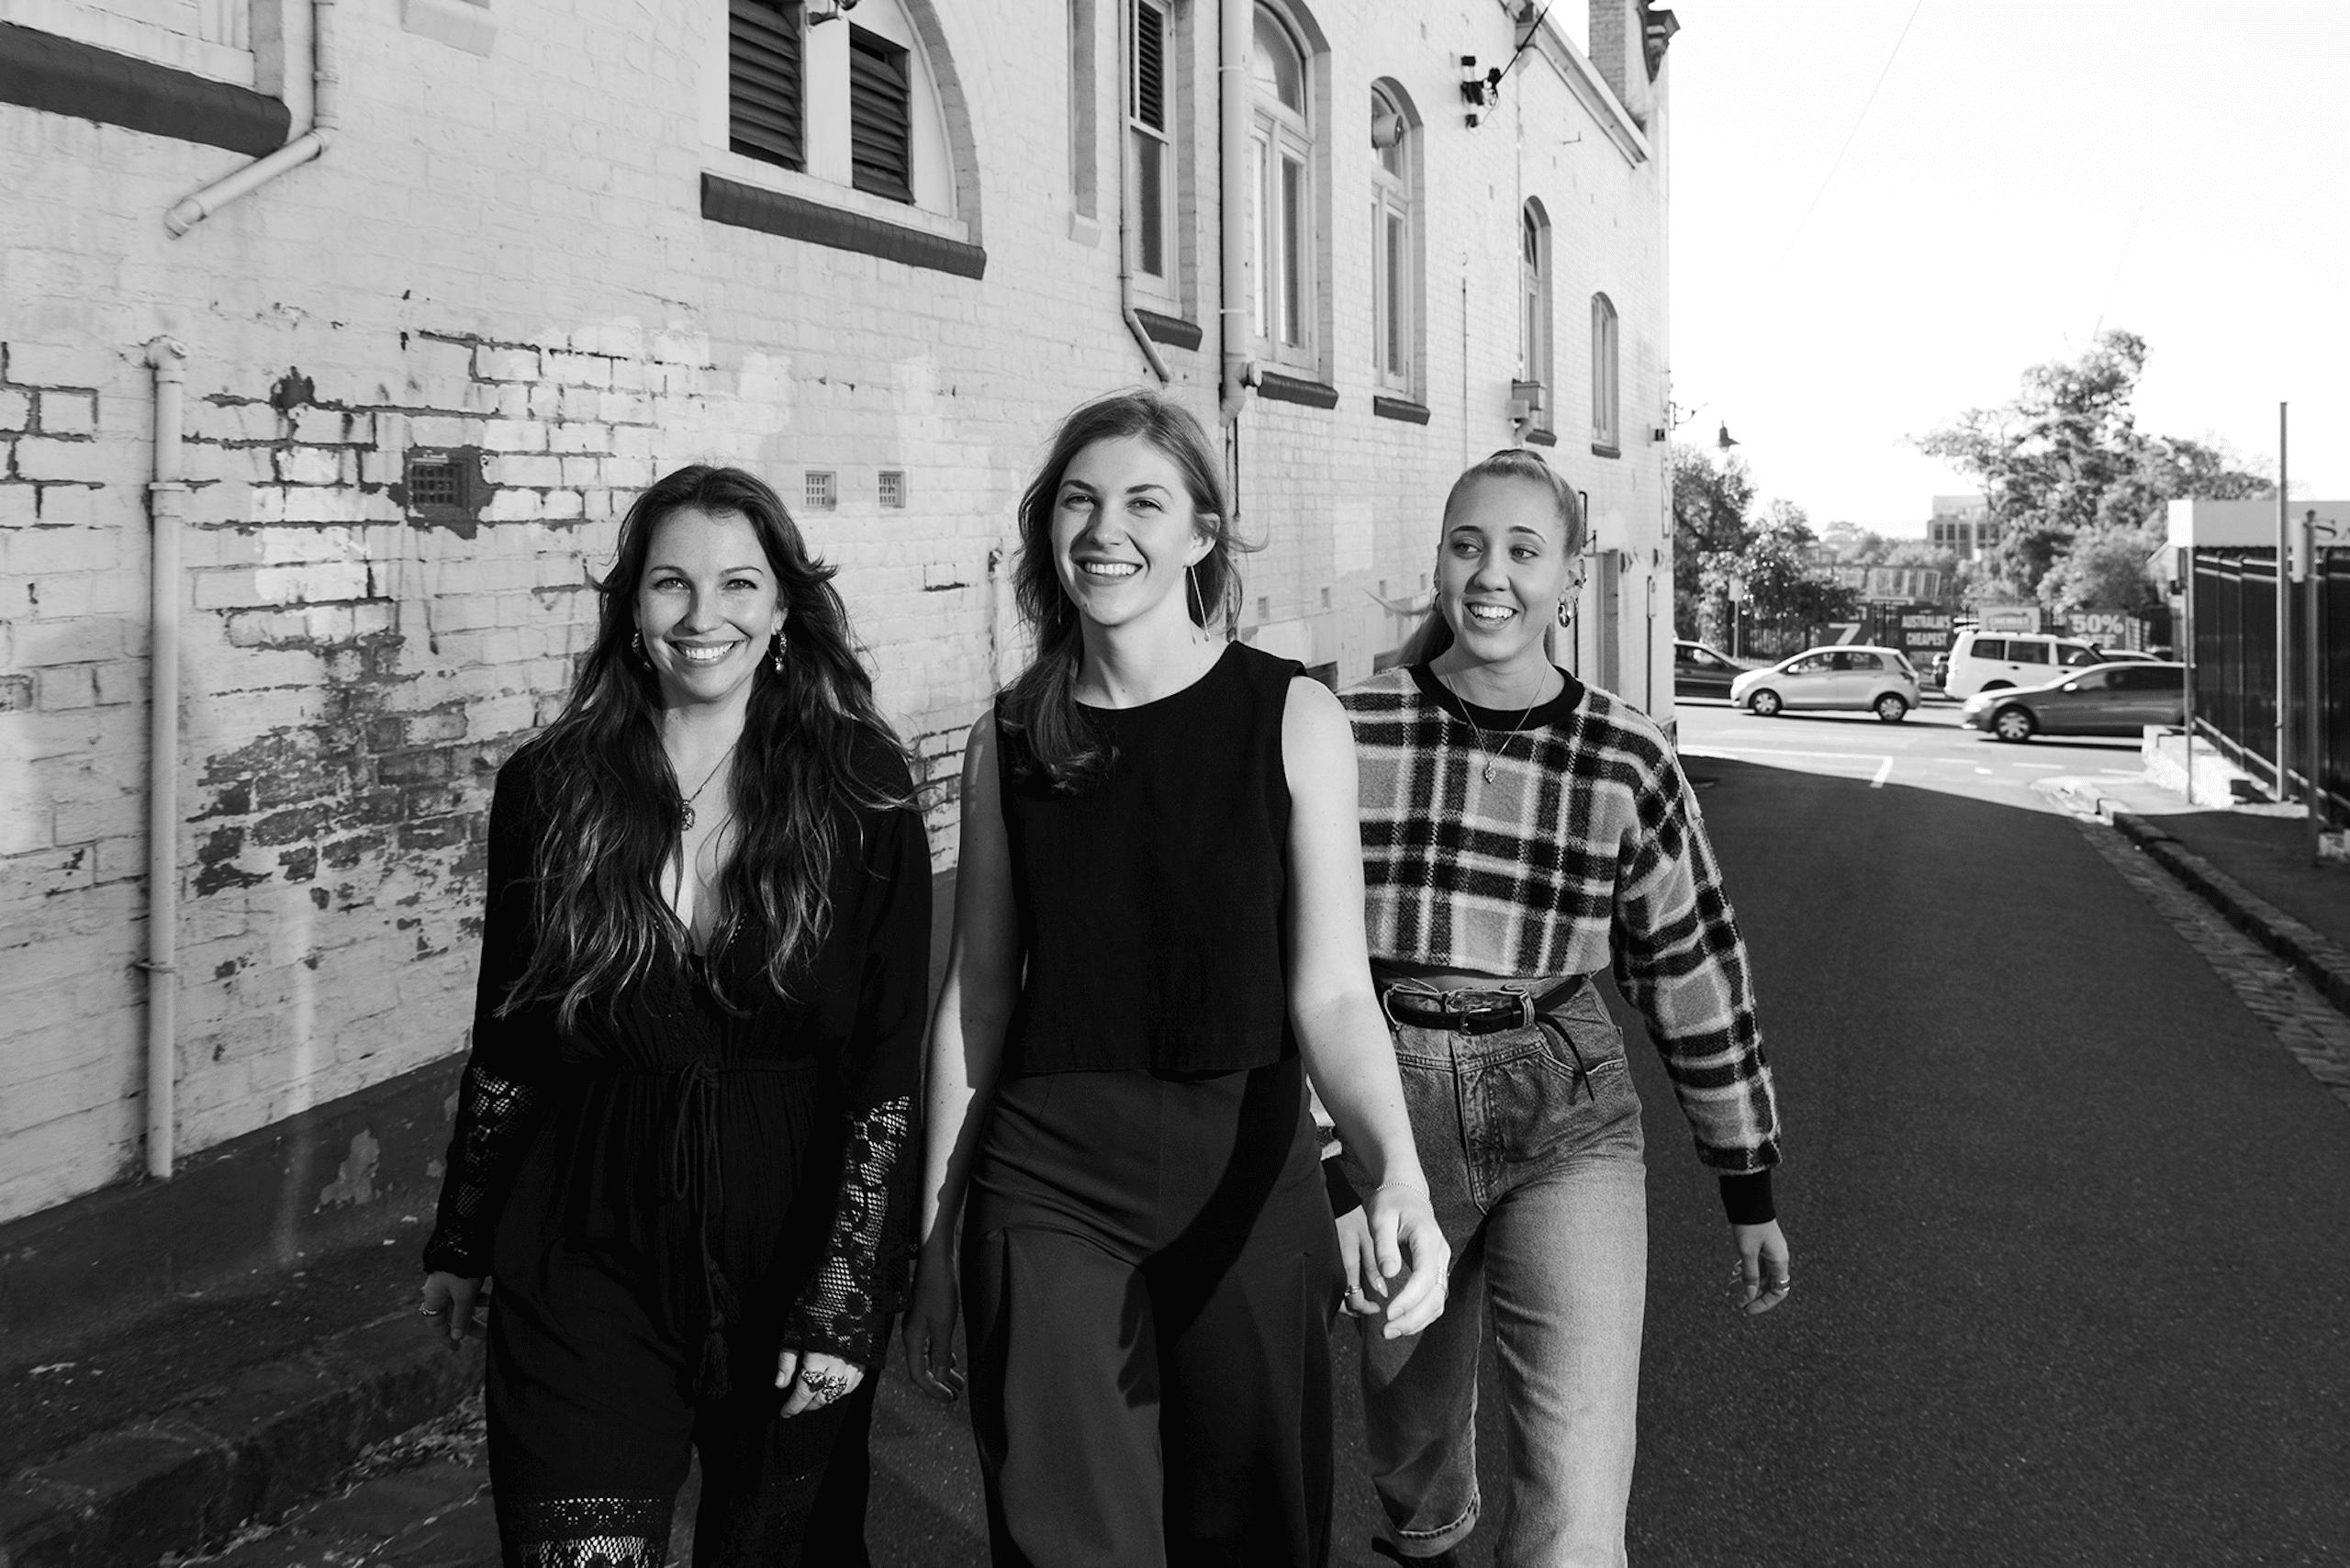 Antra, Megan and Janeva walking together